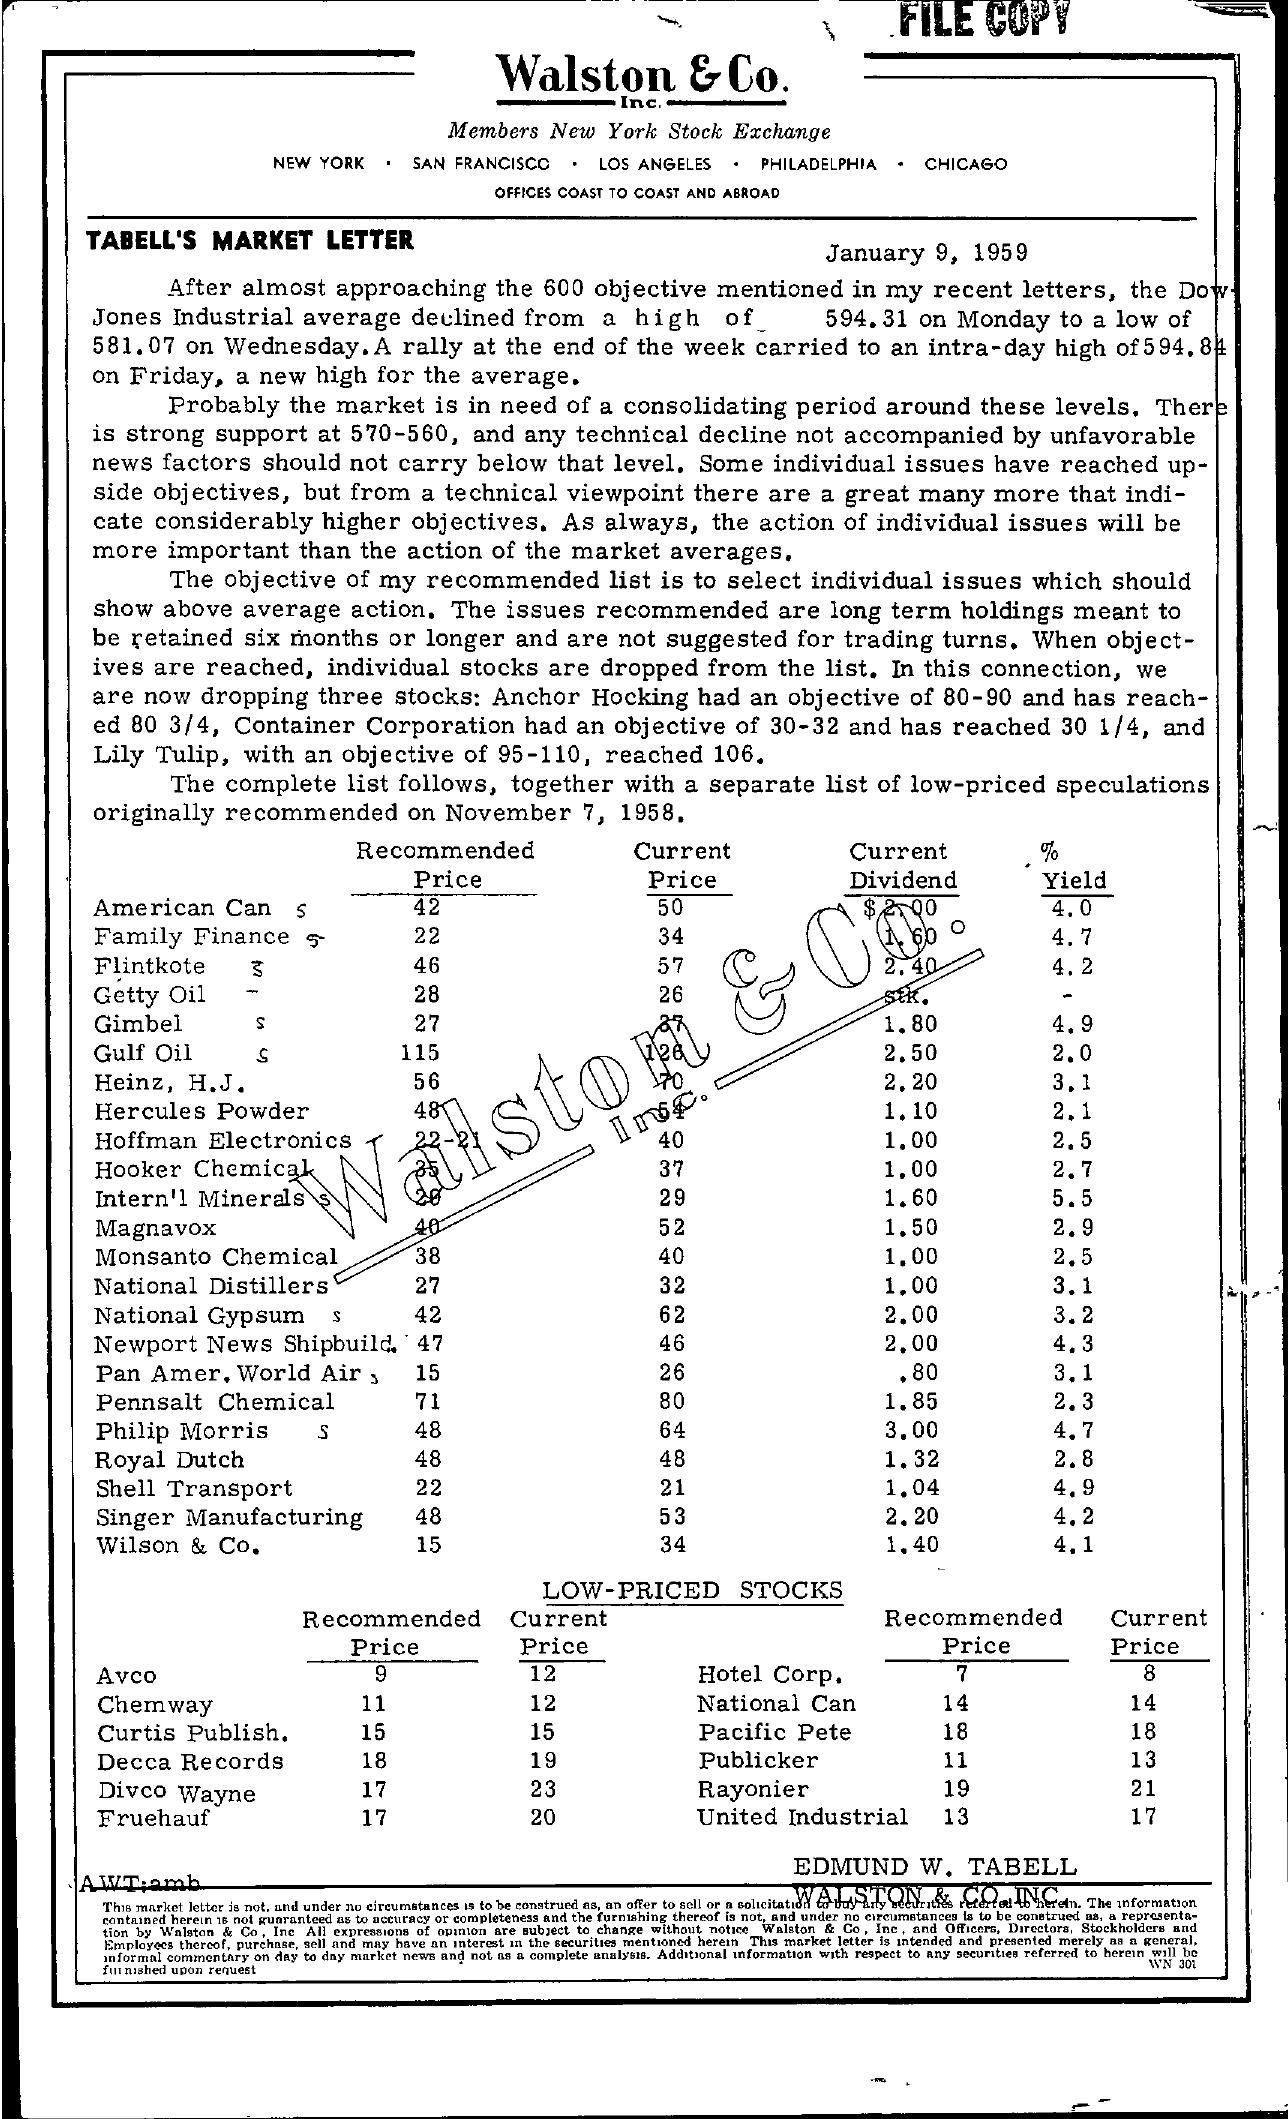 Tabell's Market Letter - January 09, 1959